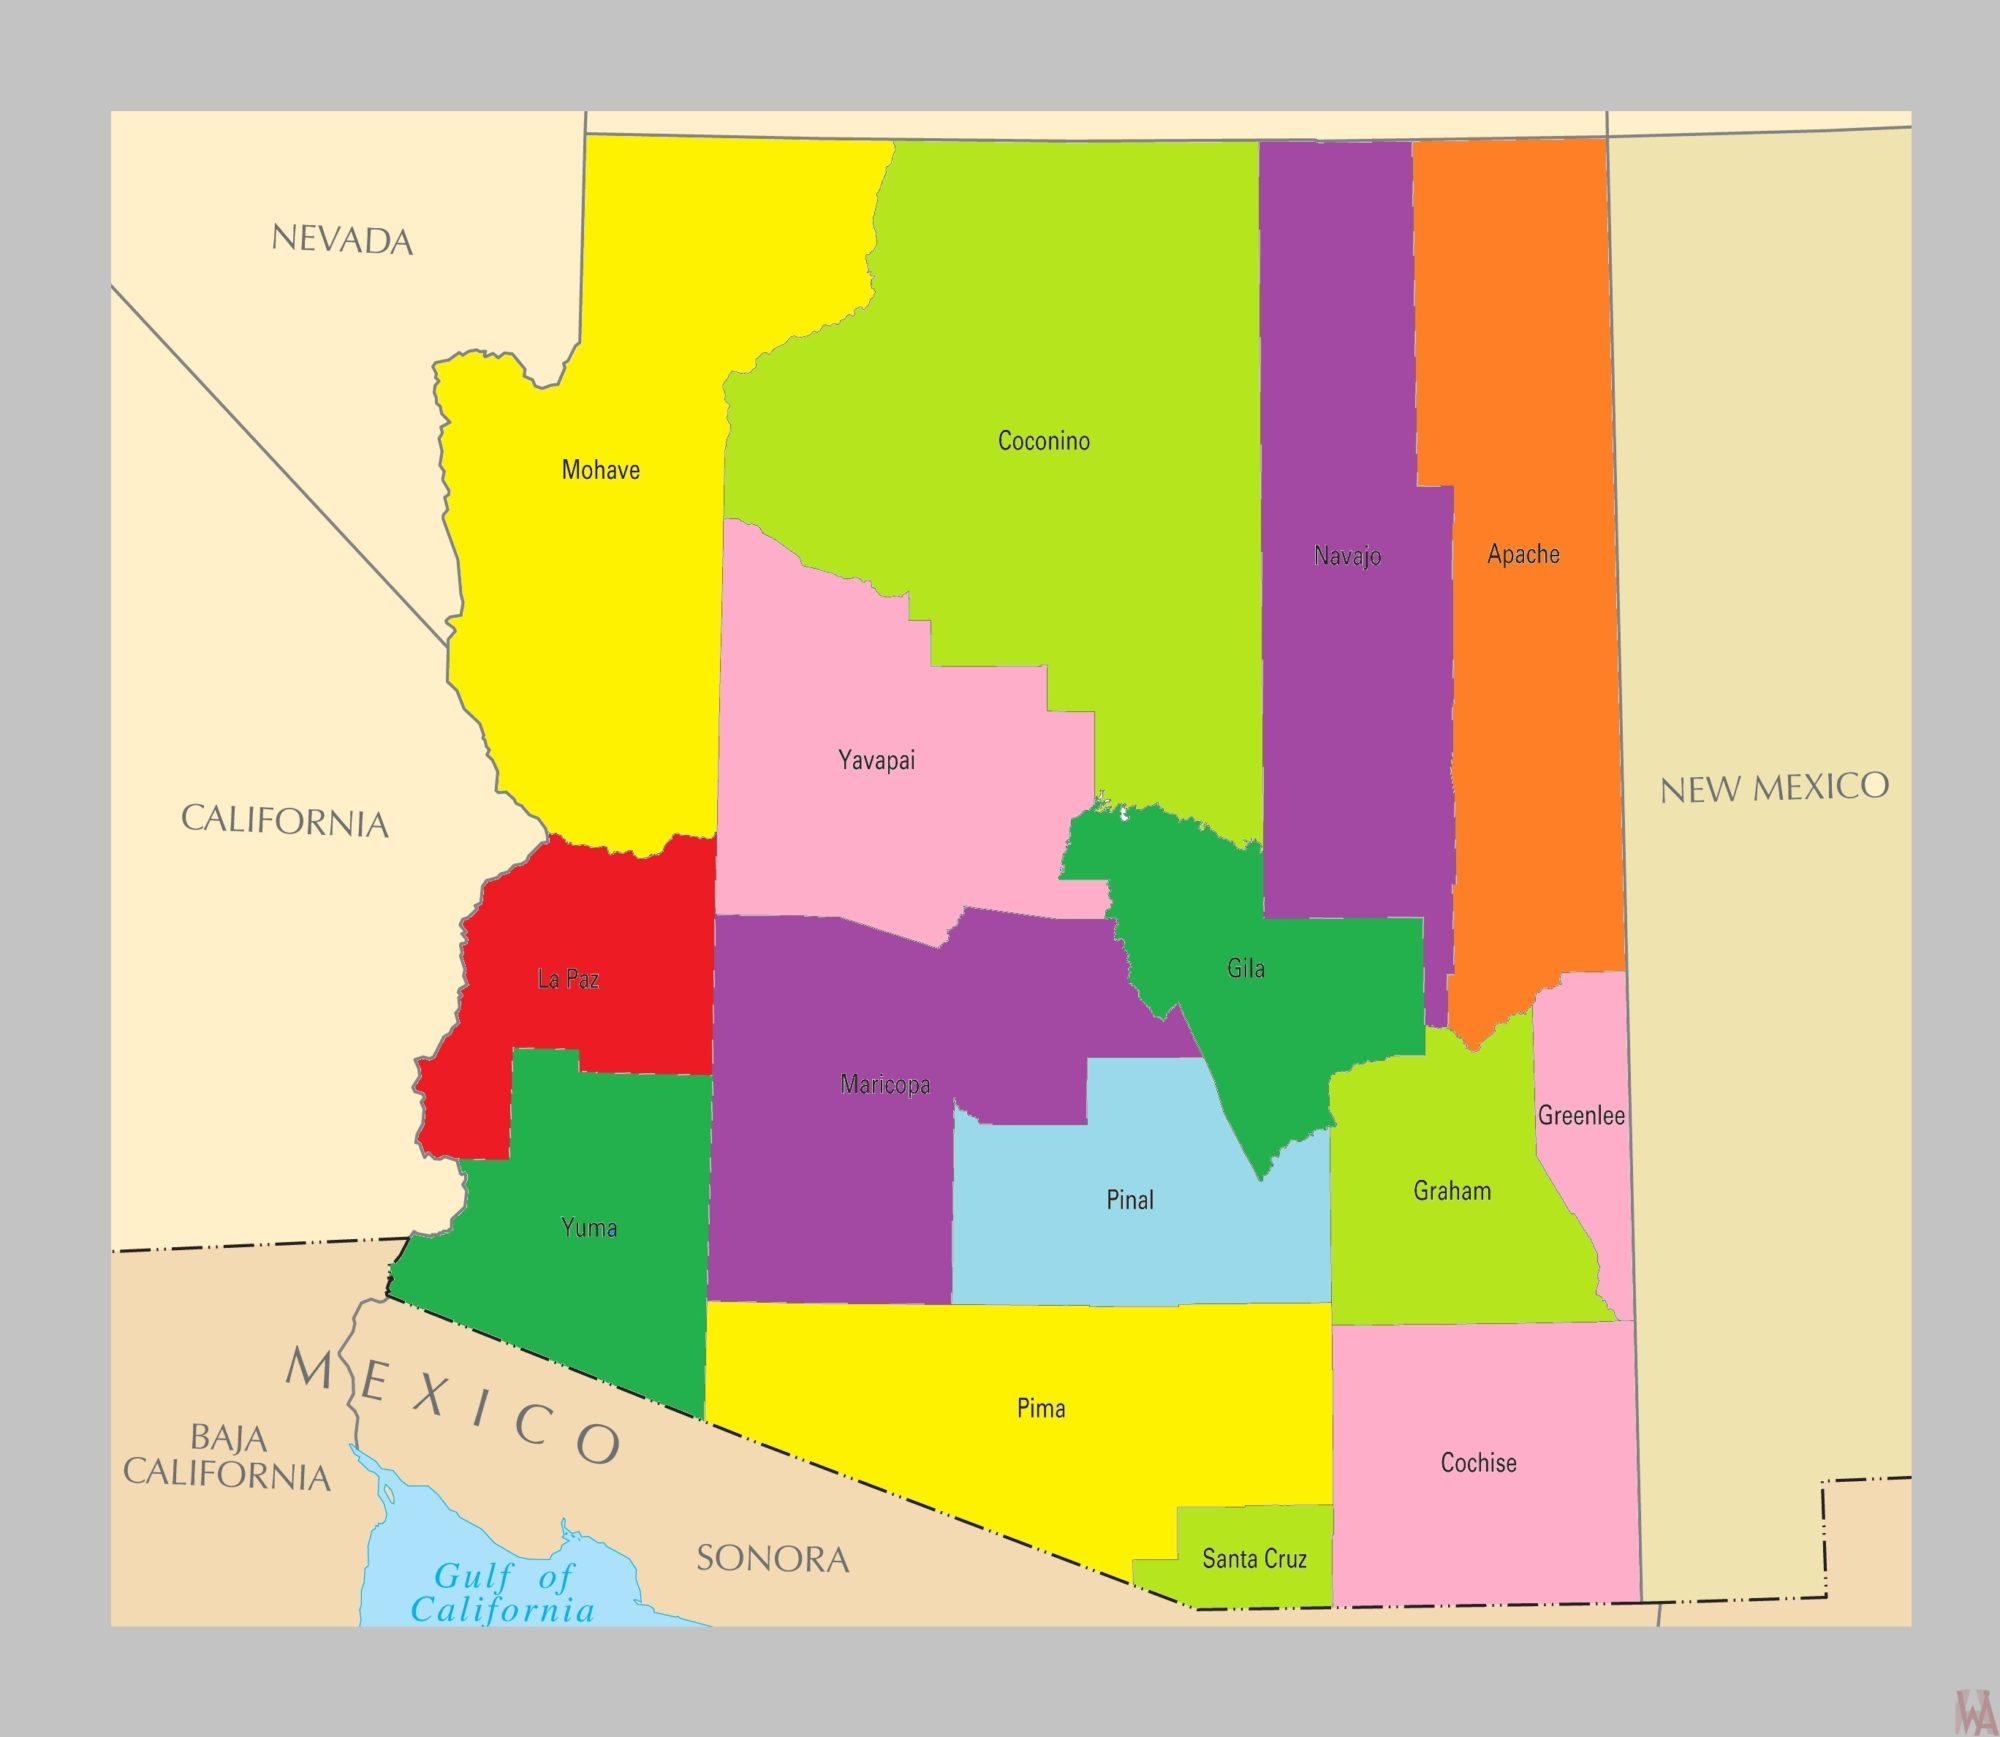 Arizona County  Map  | County Map of Arizona = 2